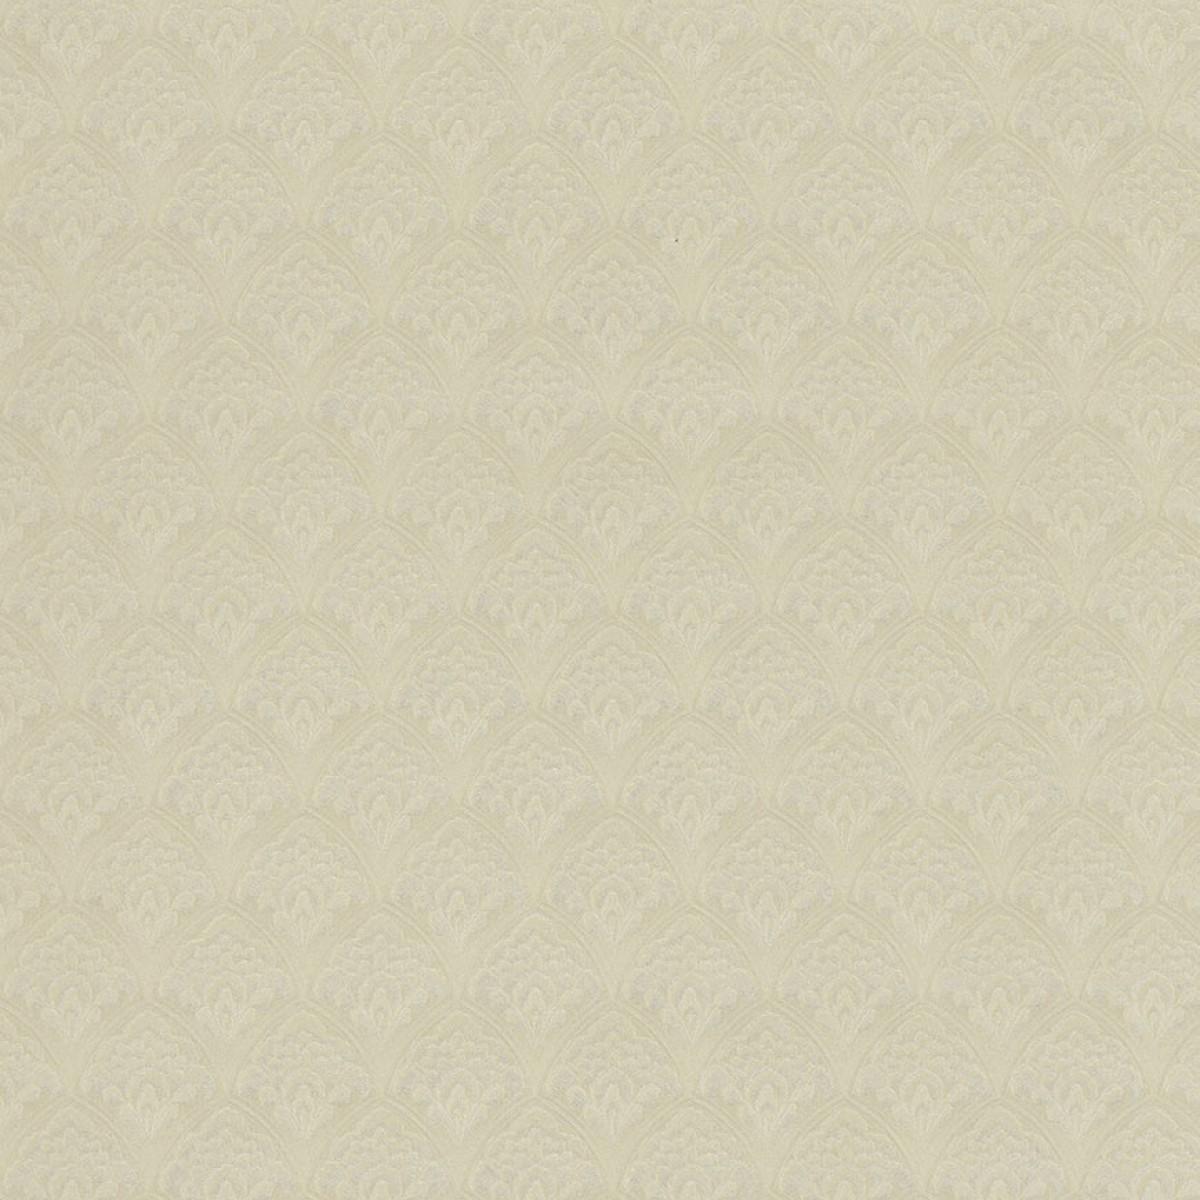 Tapet lavabil Chambord 361142, 5.2mp / rolă, Eijffinger